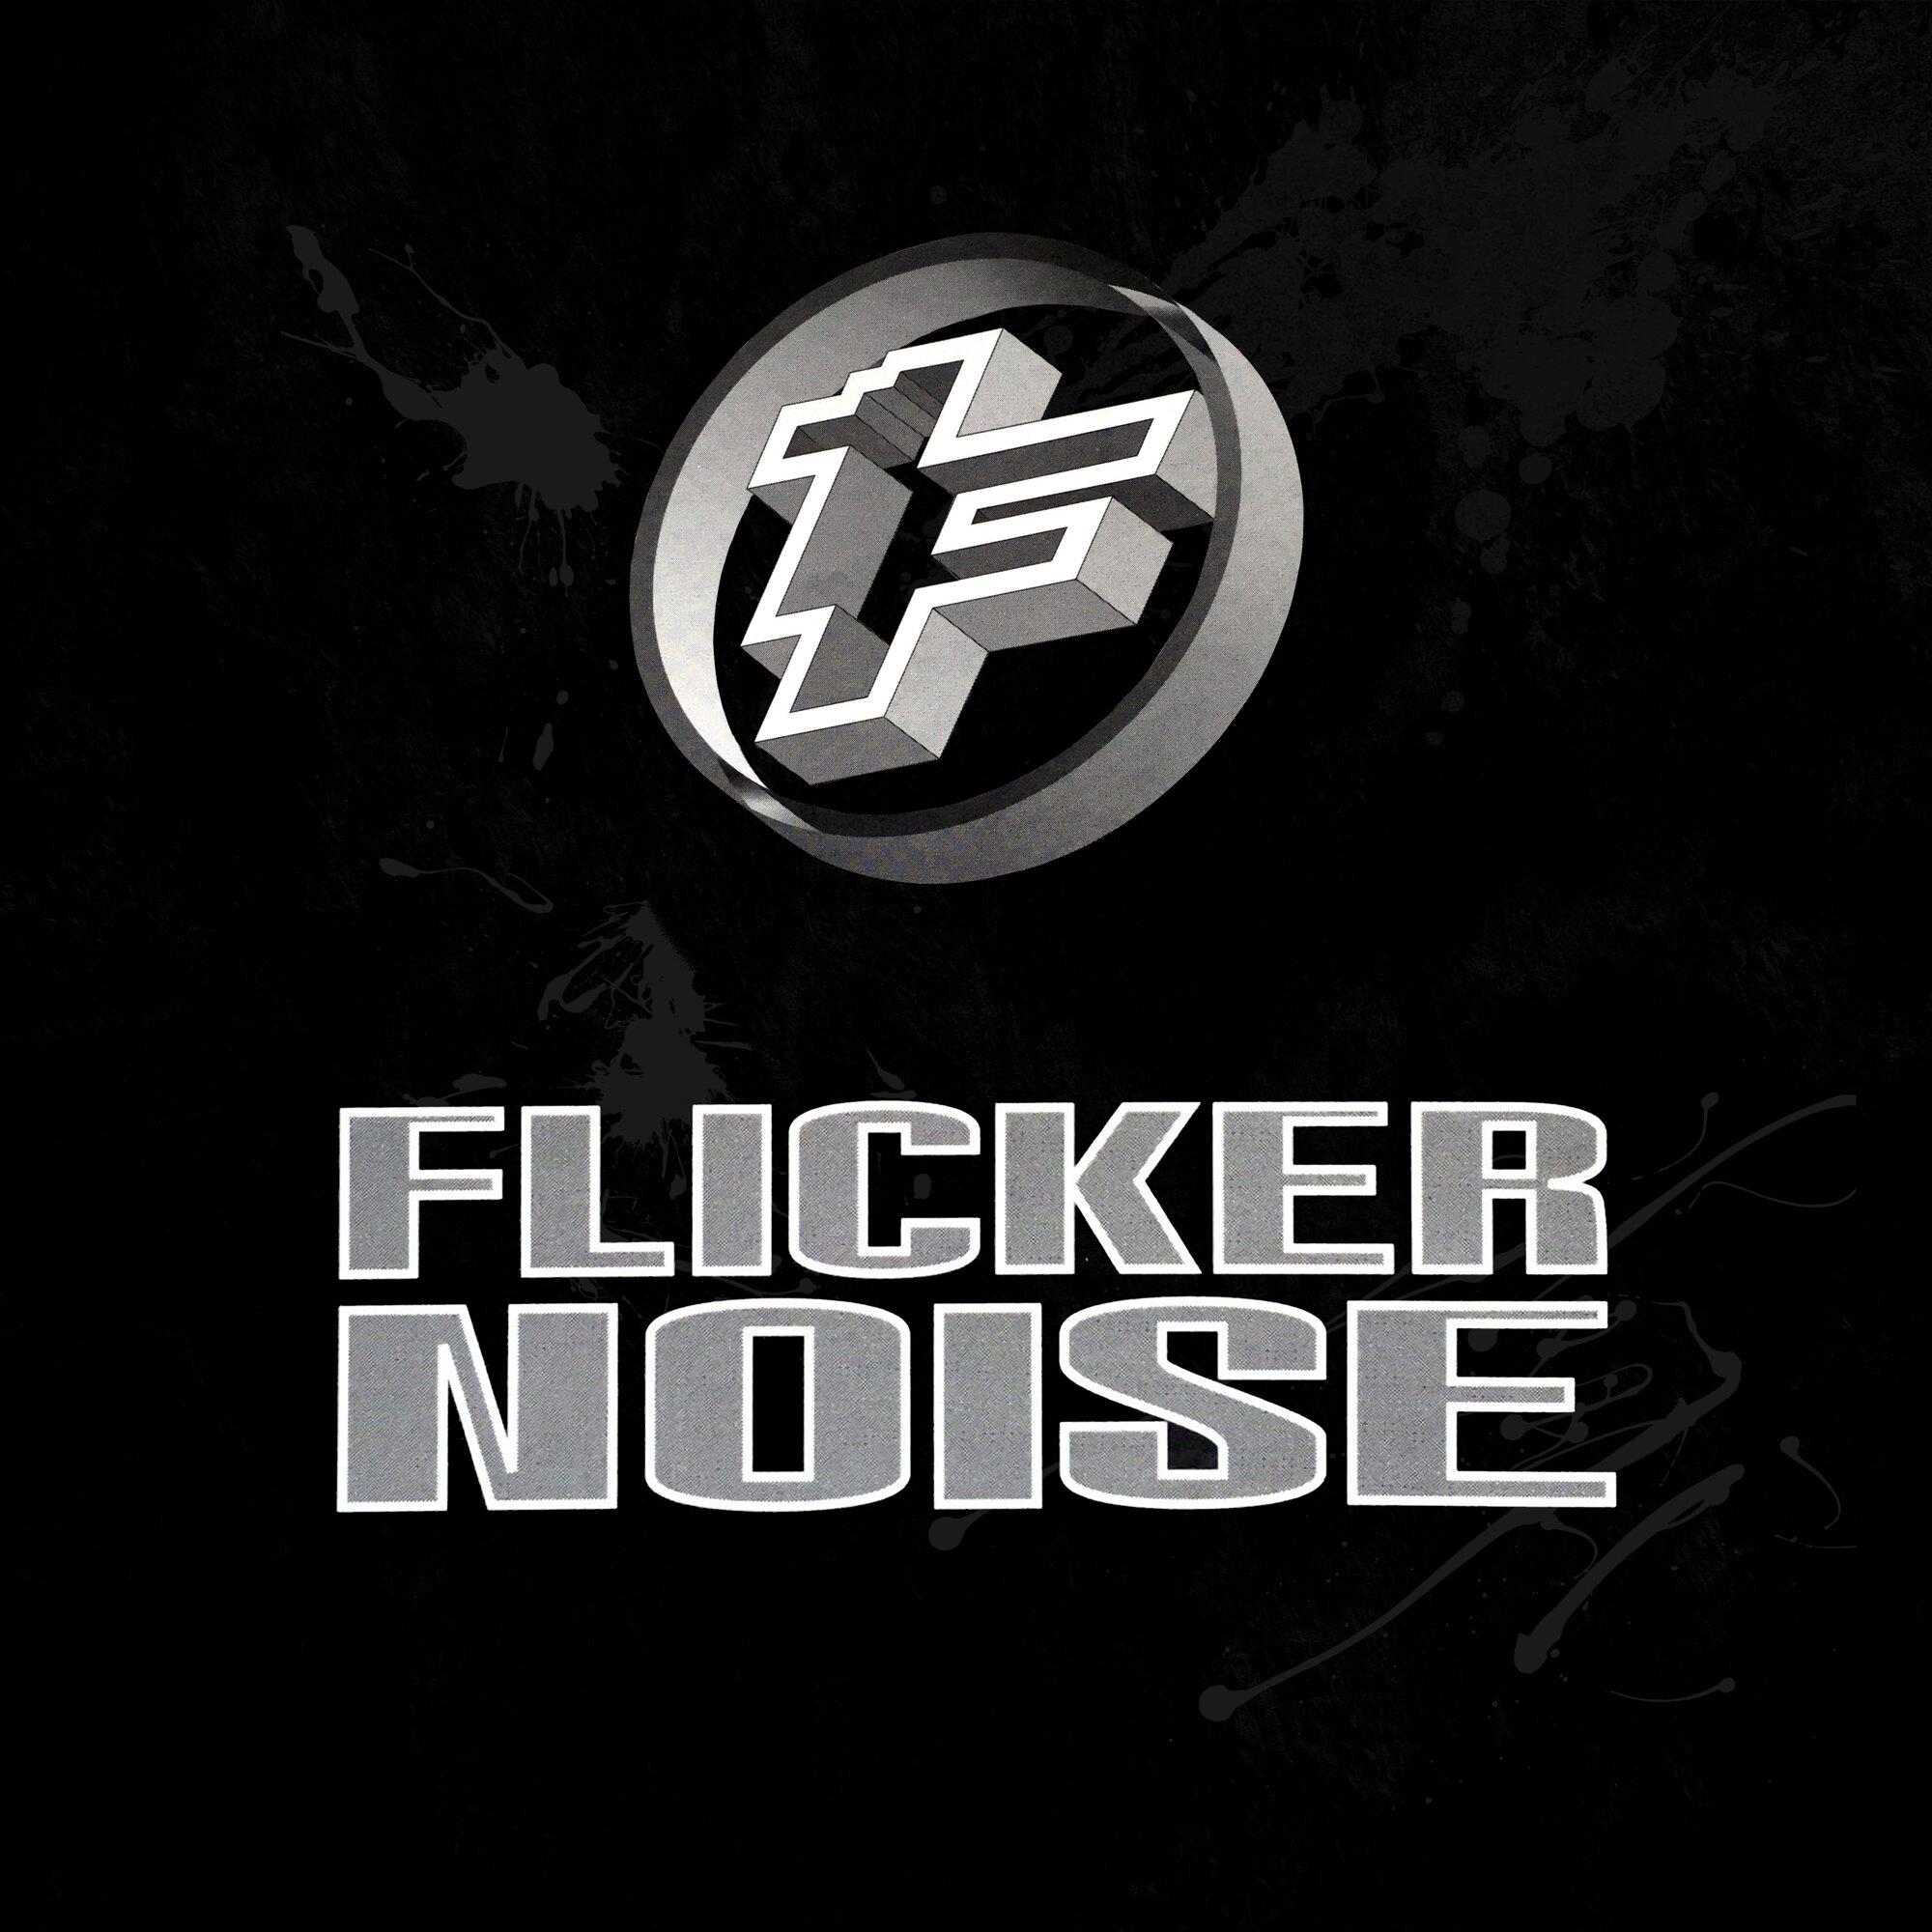 Flicker-Noise-Logo.jpg